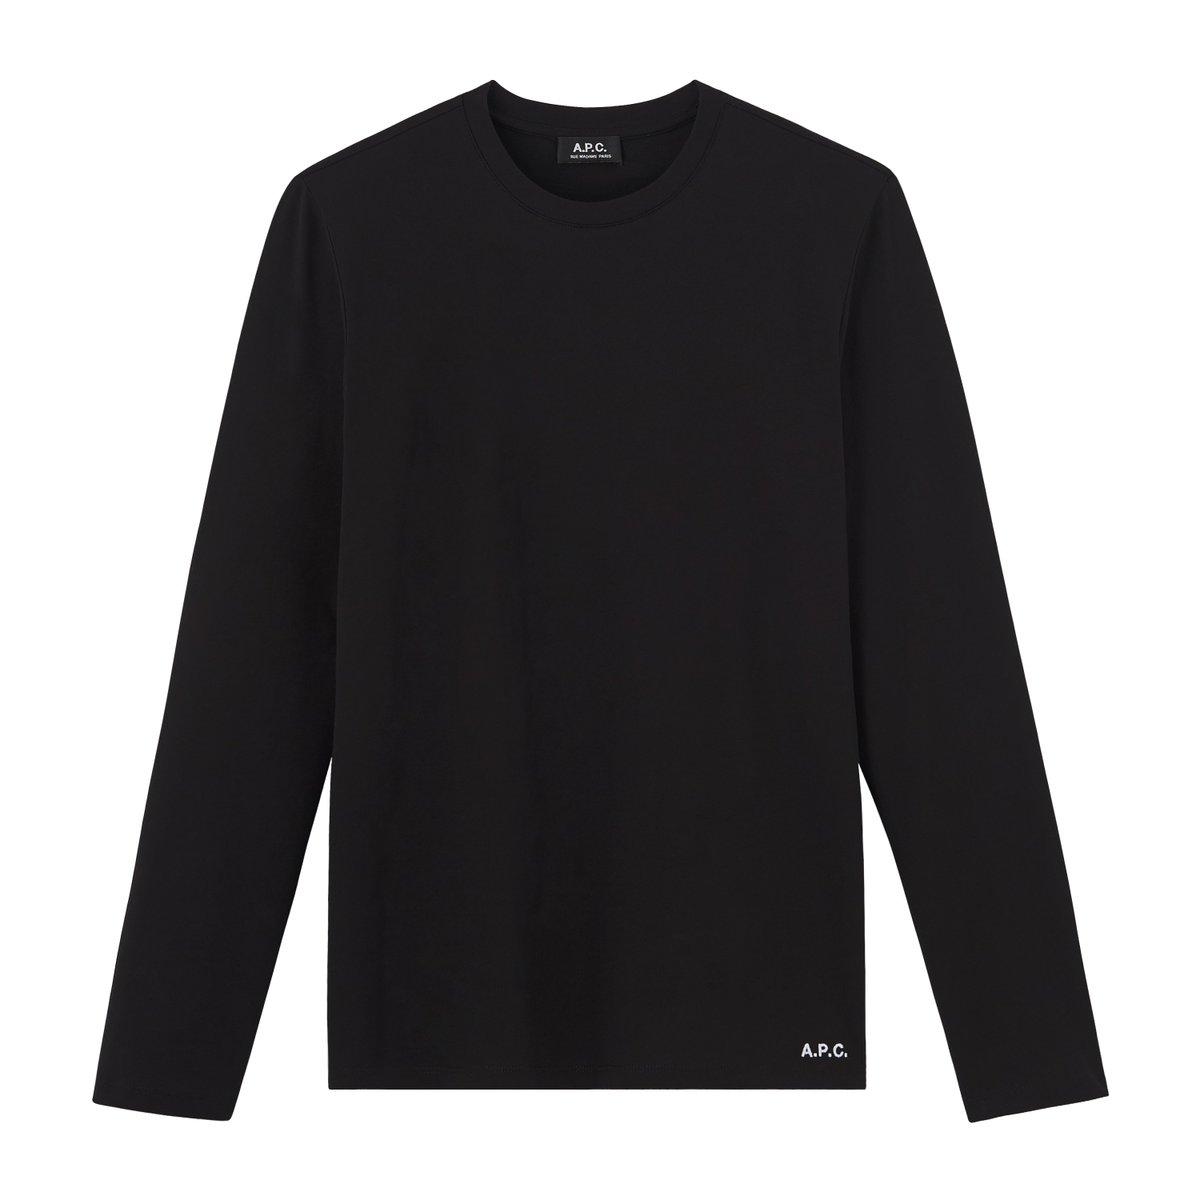 #APCBAMBAM Tシャツ 2月15日より、オンラインストアを含むすべてのコレクションショップで販売いたします。 https://t.co/xMH4w2wdfl